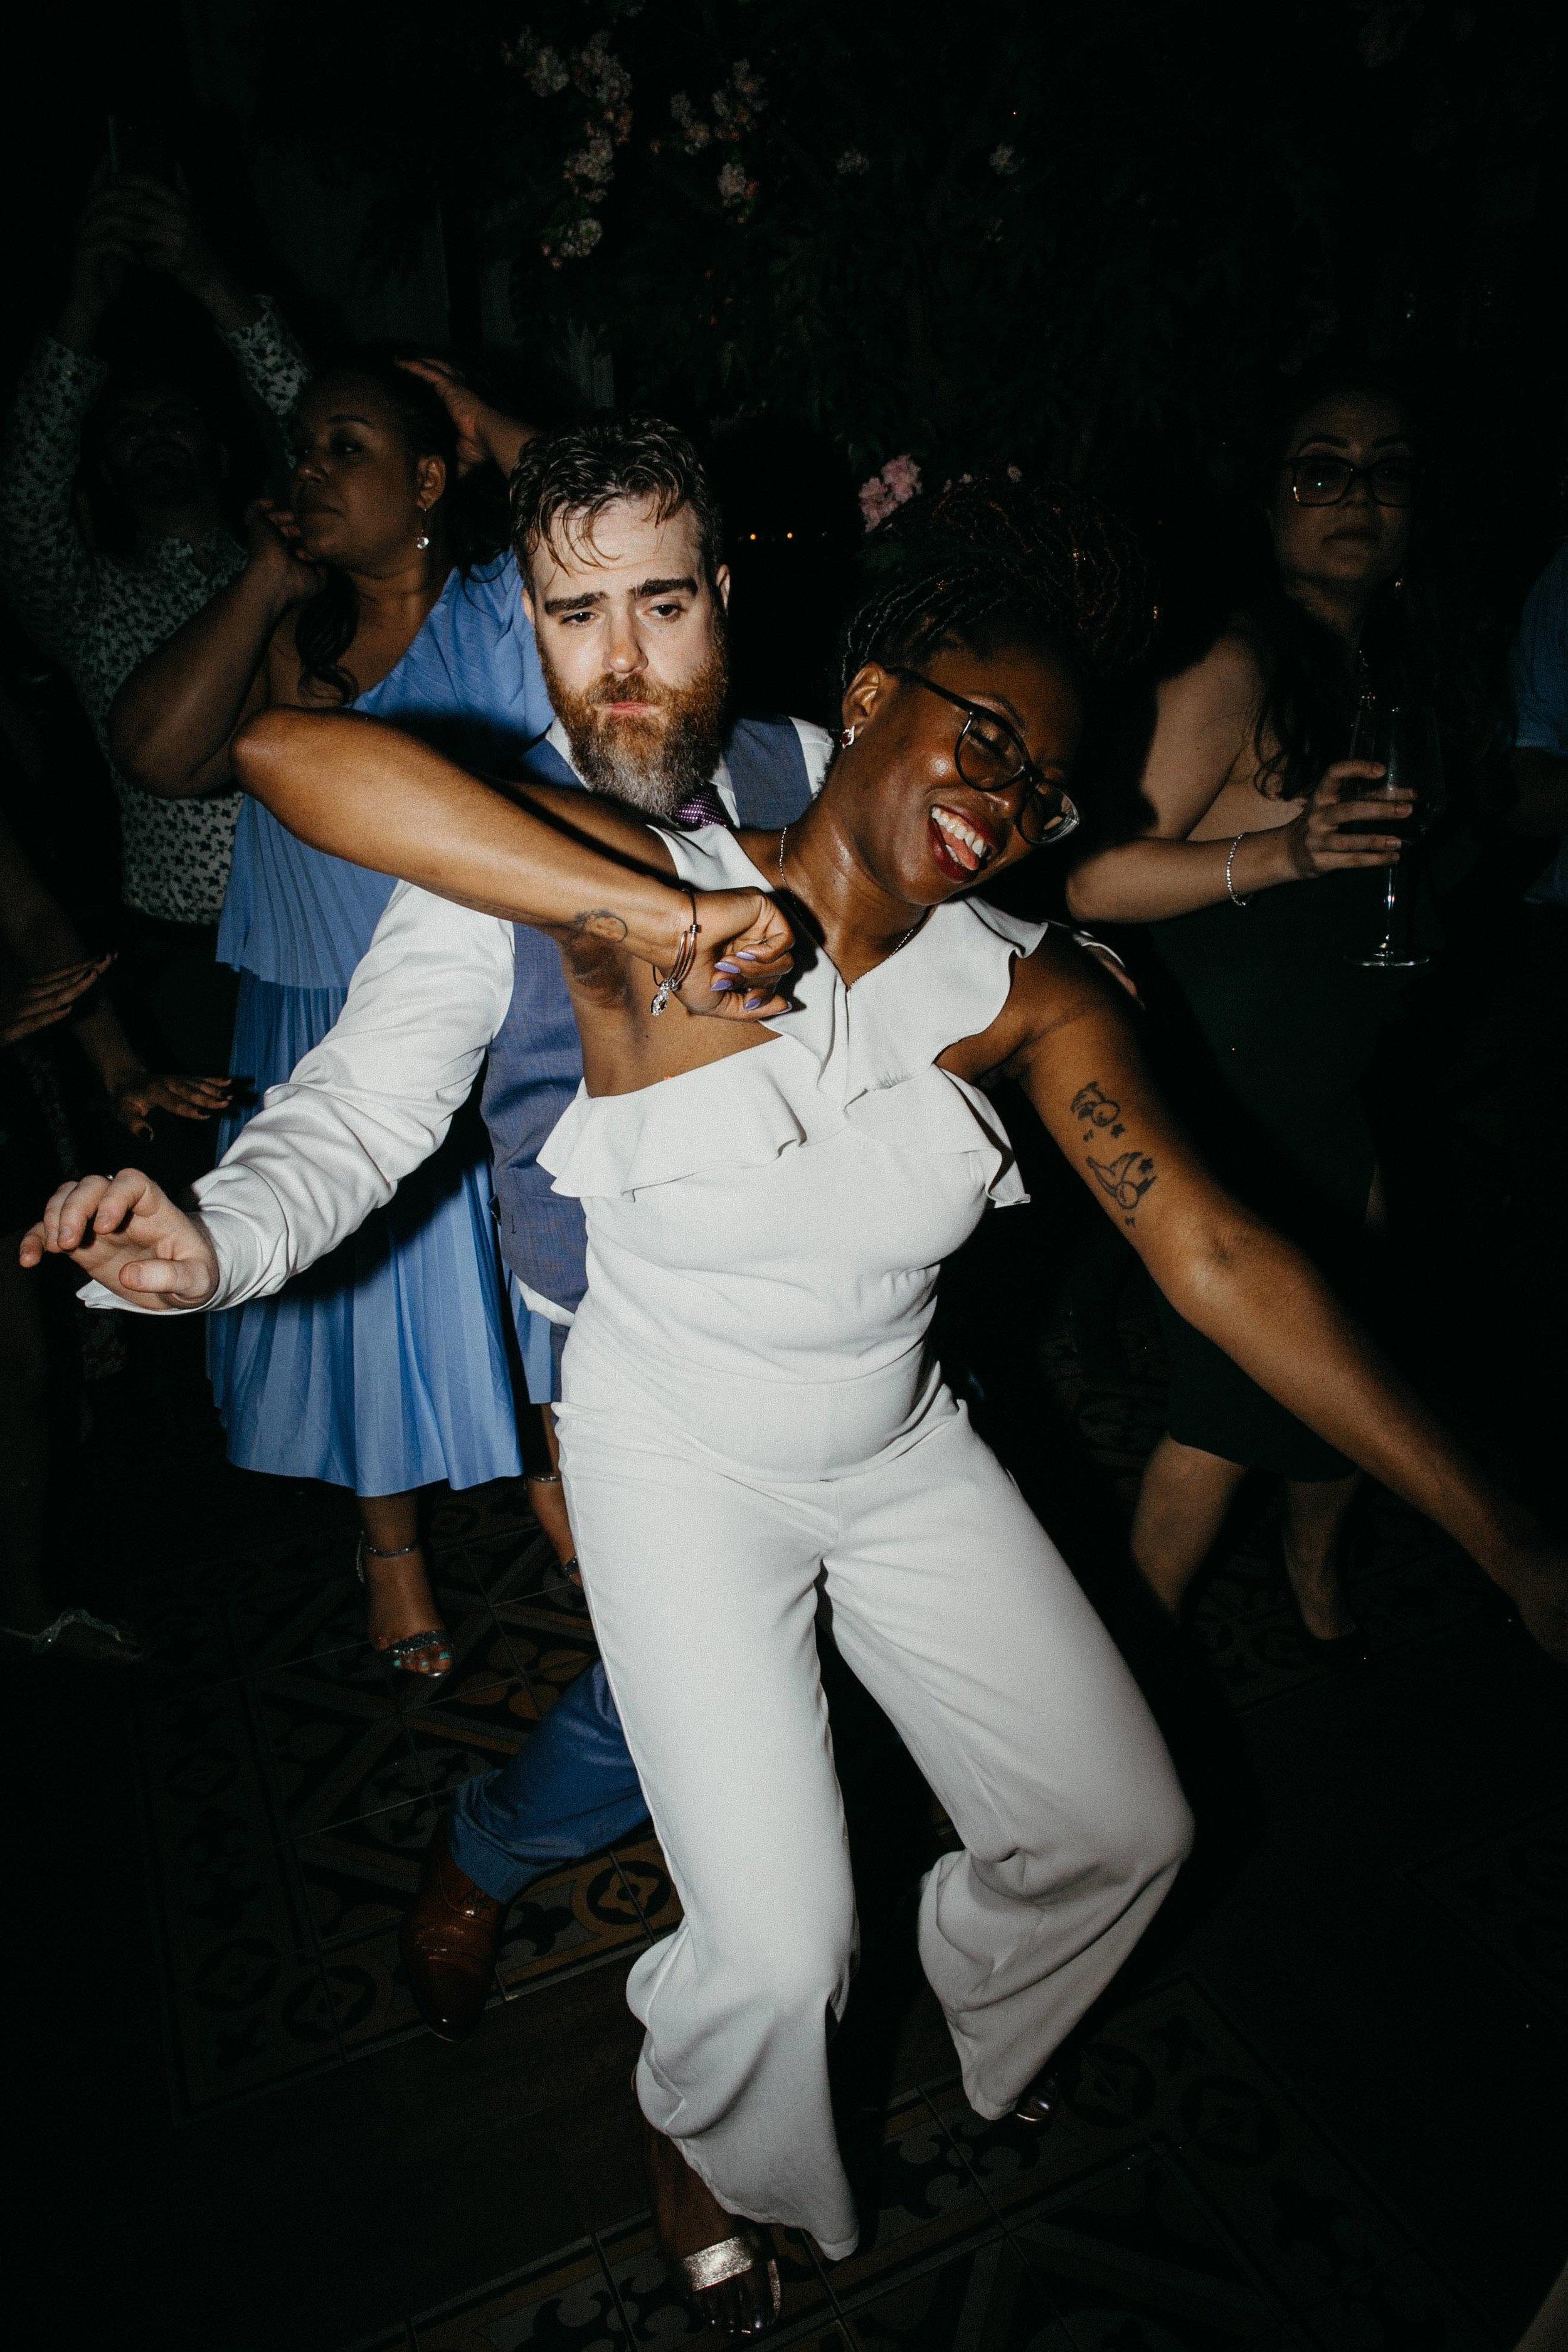 Sevlynn-Photography-Wedding-LIC-Landing-Maiella-NYC-71.jpg